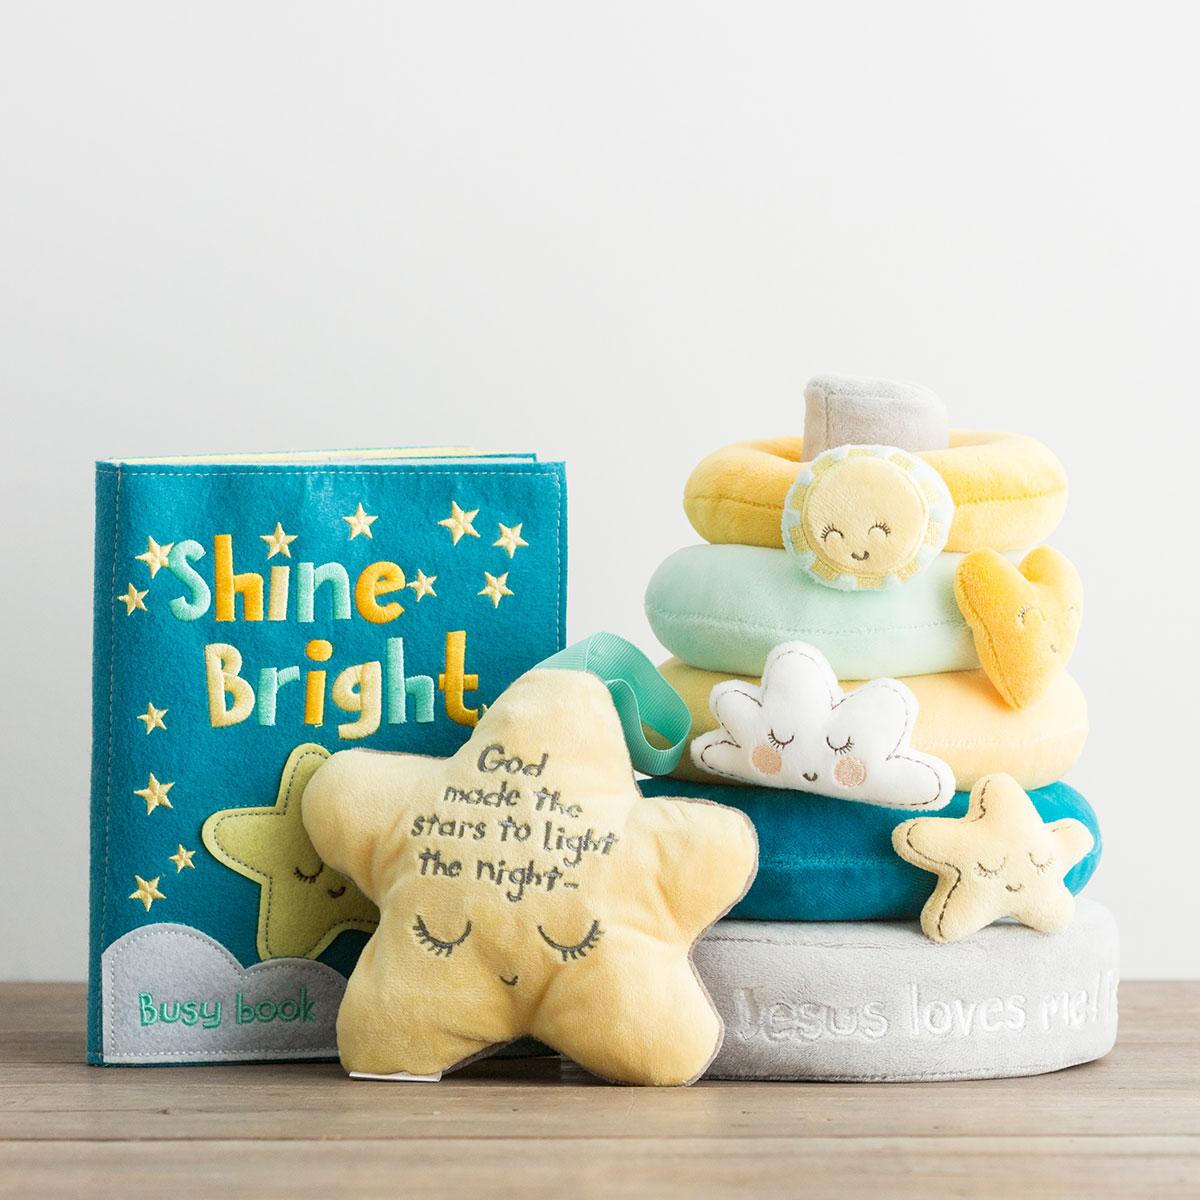 Sam & Essie - Jesus Loves Me - Stacker Rings, Crinkle Plush & Busy Book Gift Set